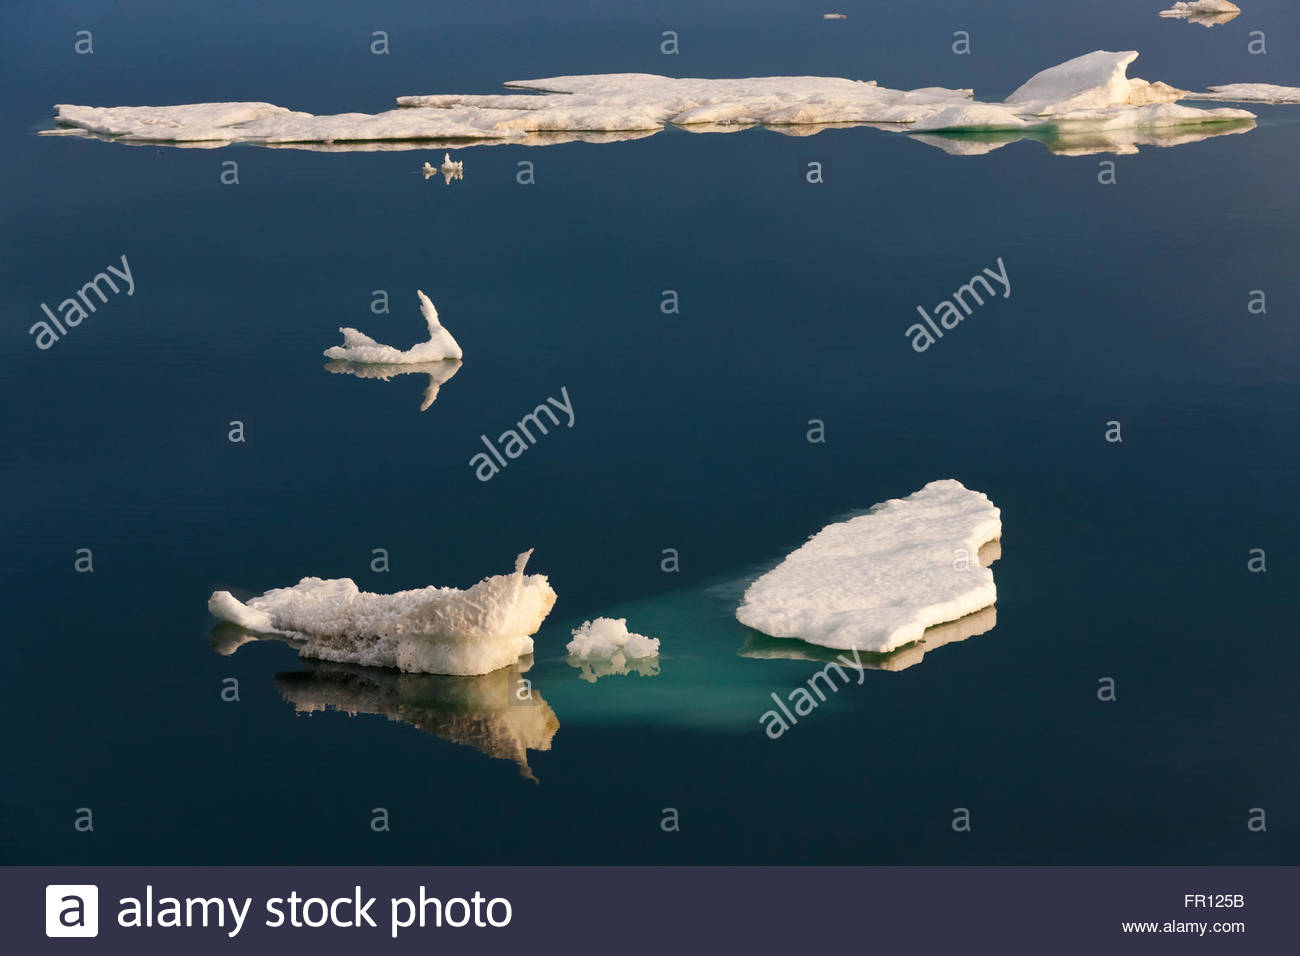 Floating ice in Chukchi Sea, Russia Far East - Stock Image